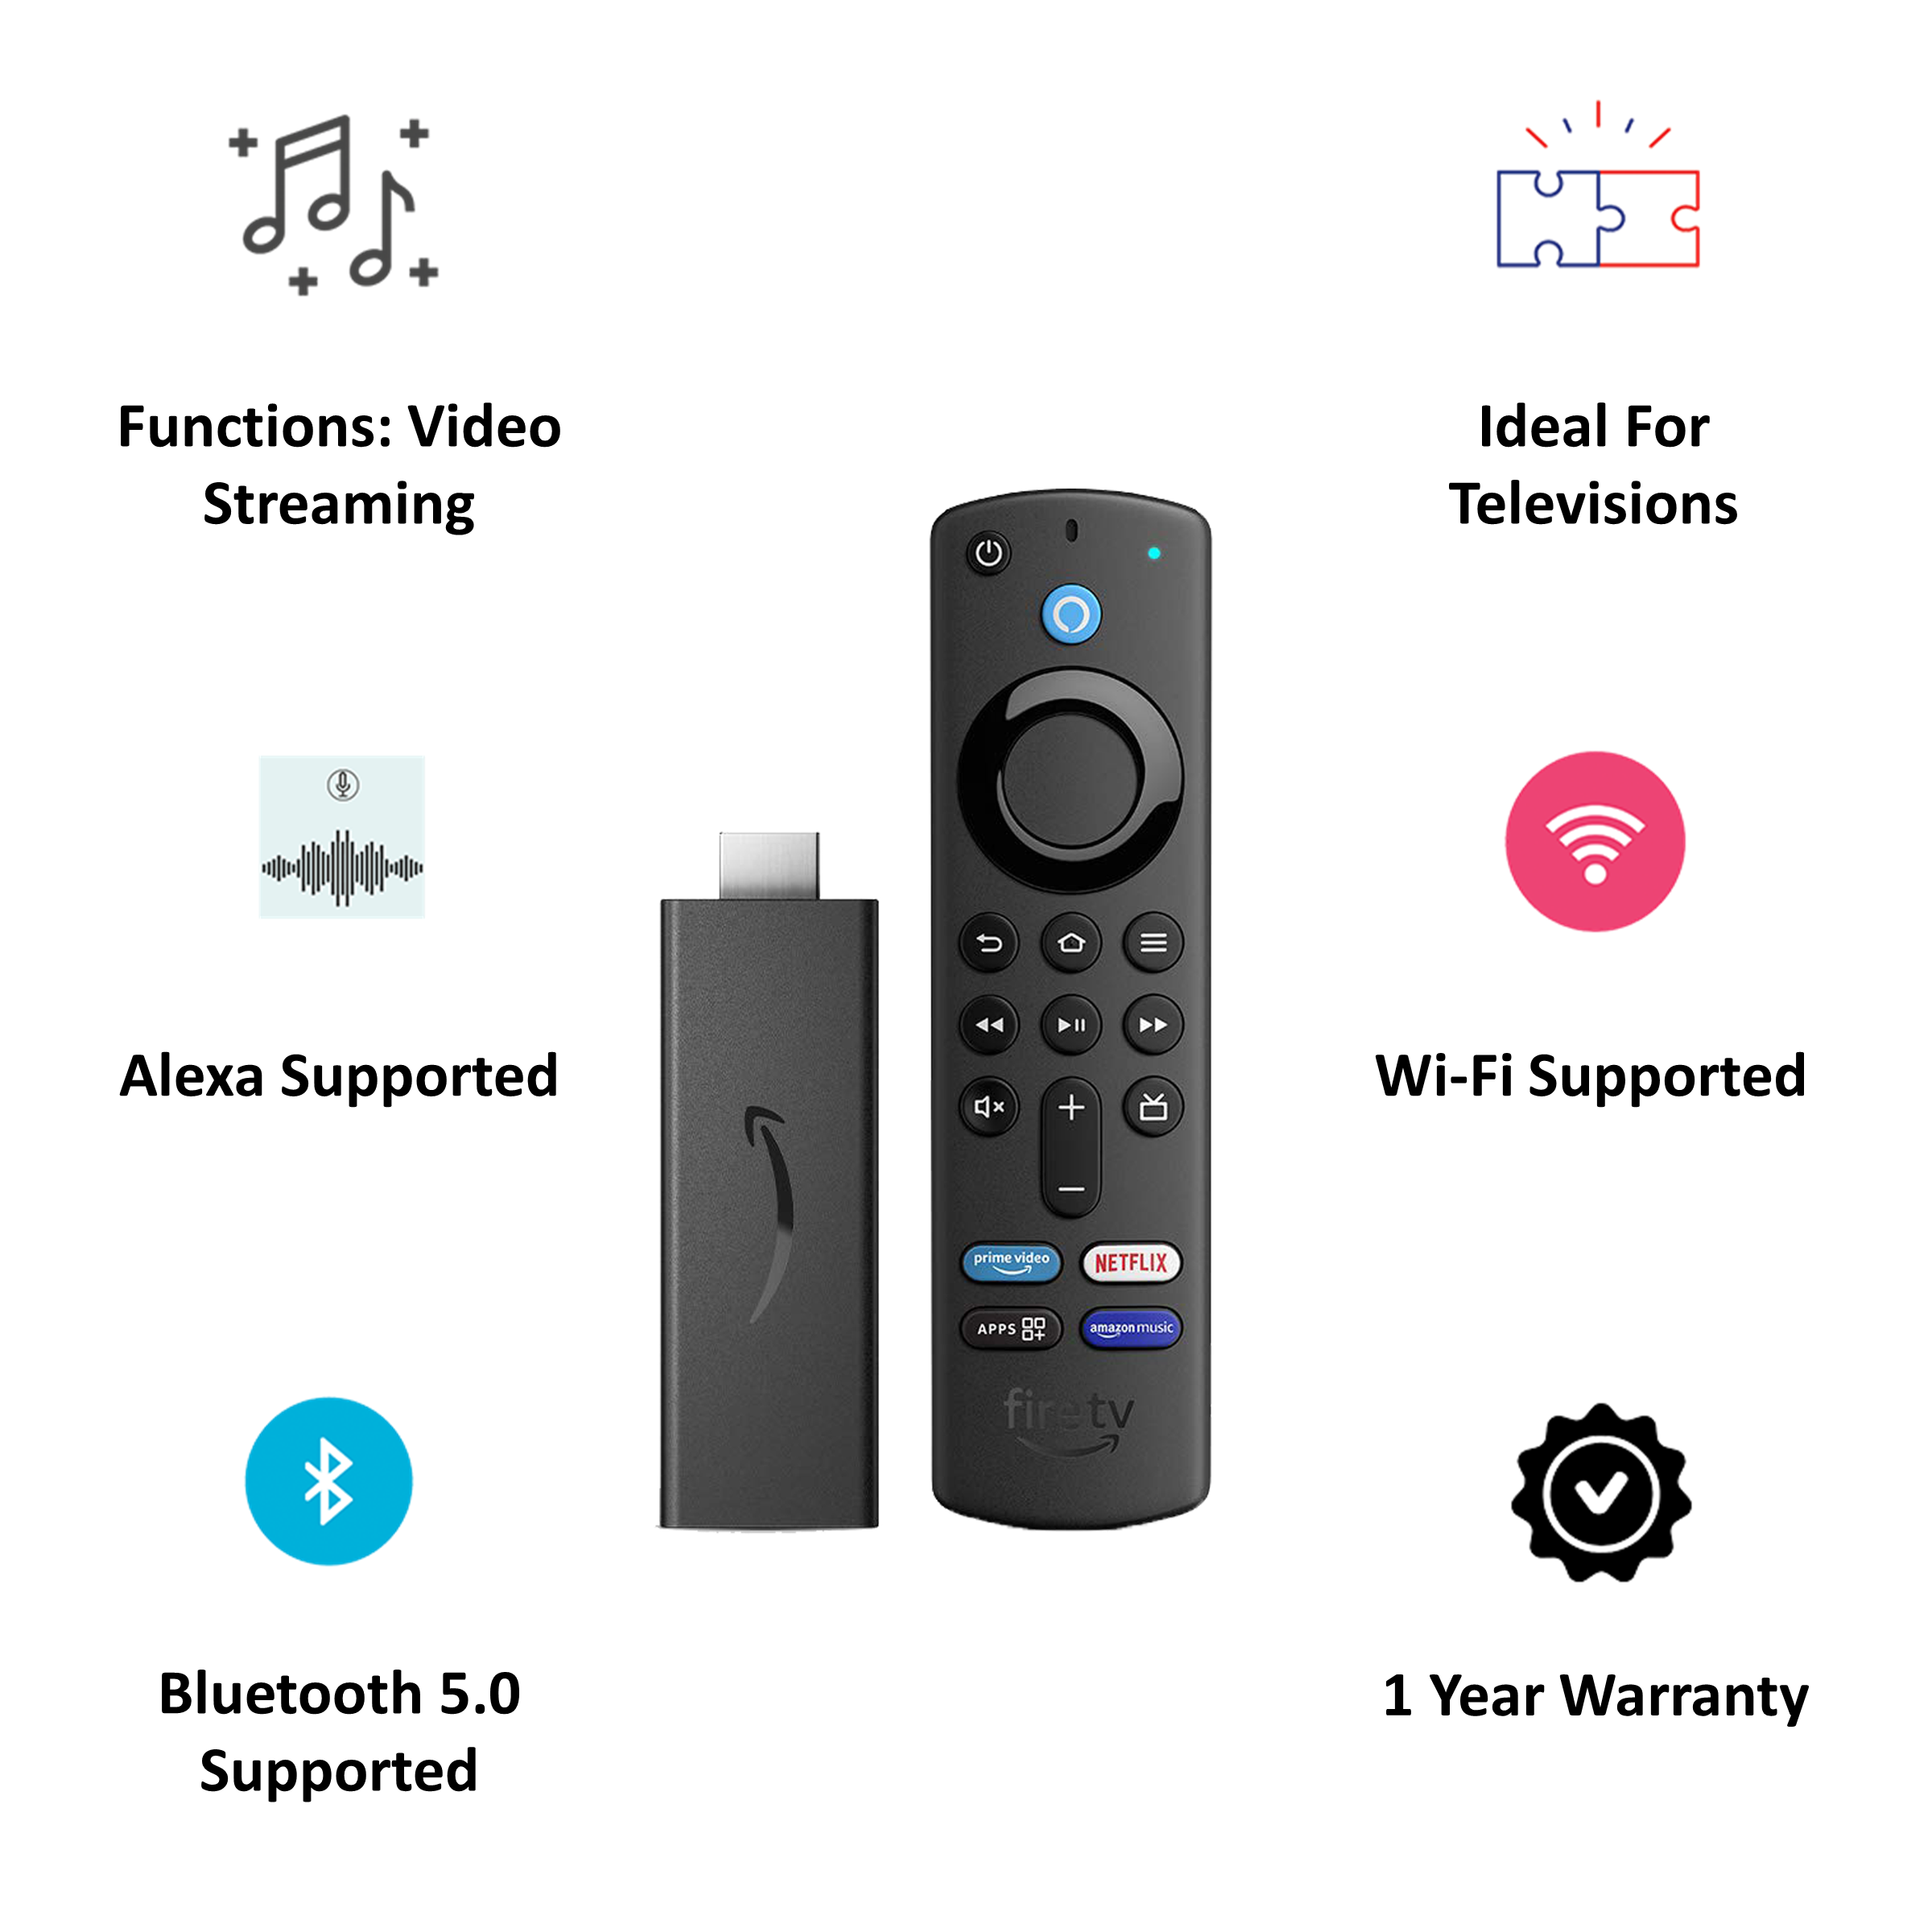 Amazon Fire TV Stick 3rd Gen with Alexa Voice Remote (Quad Core Processor, B08C1KQRR5, Black) 3